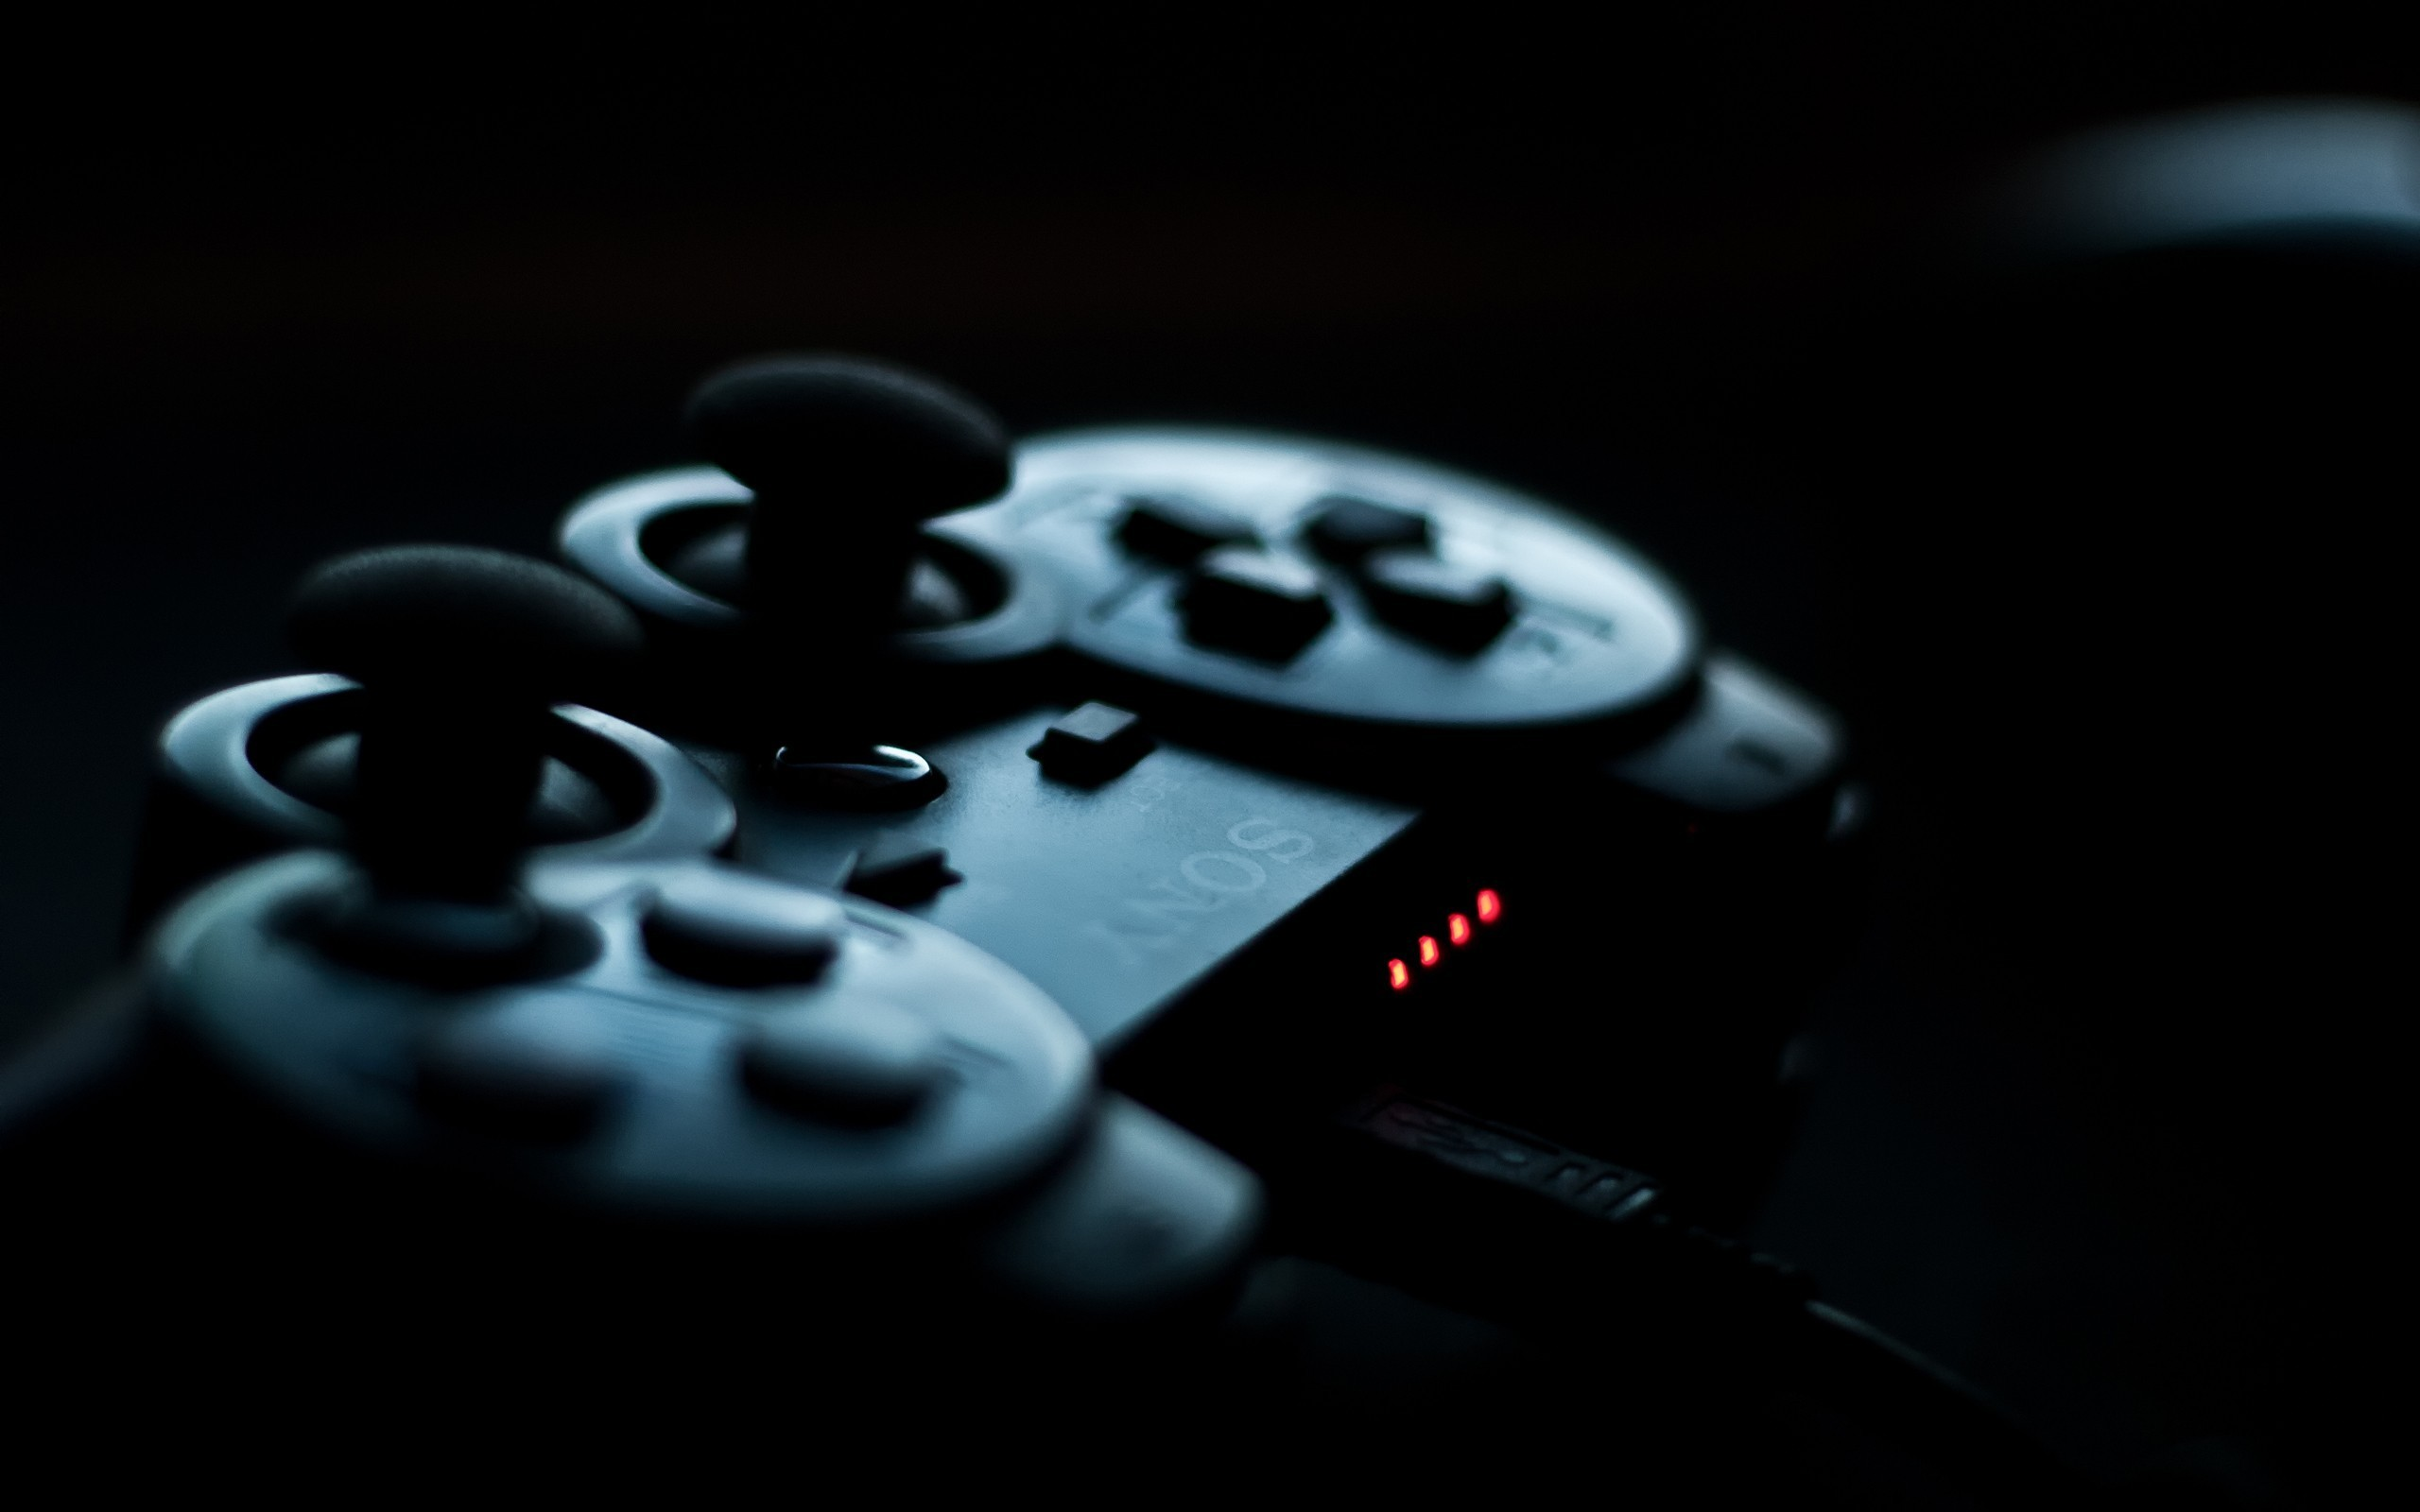 Video Games Increase Multitasking Skills